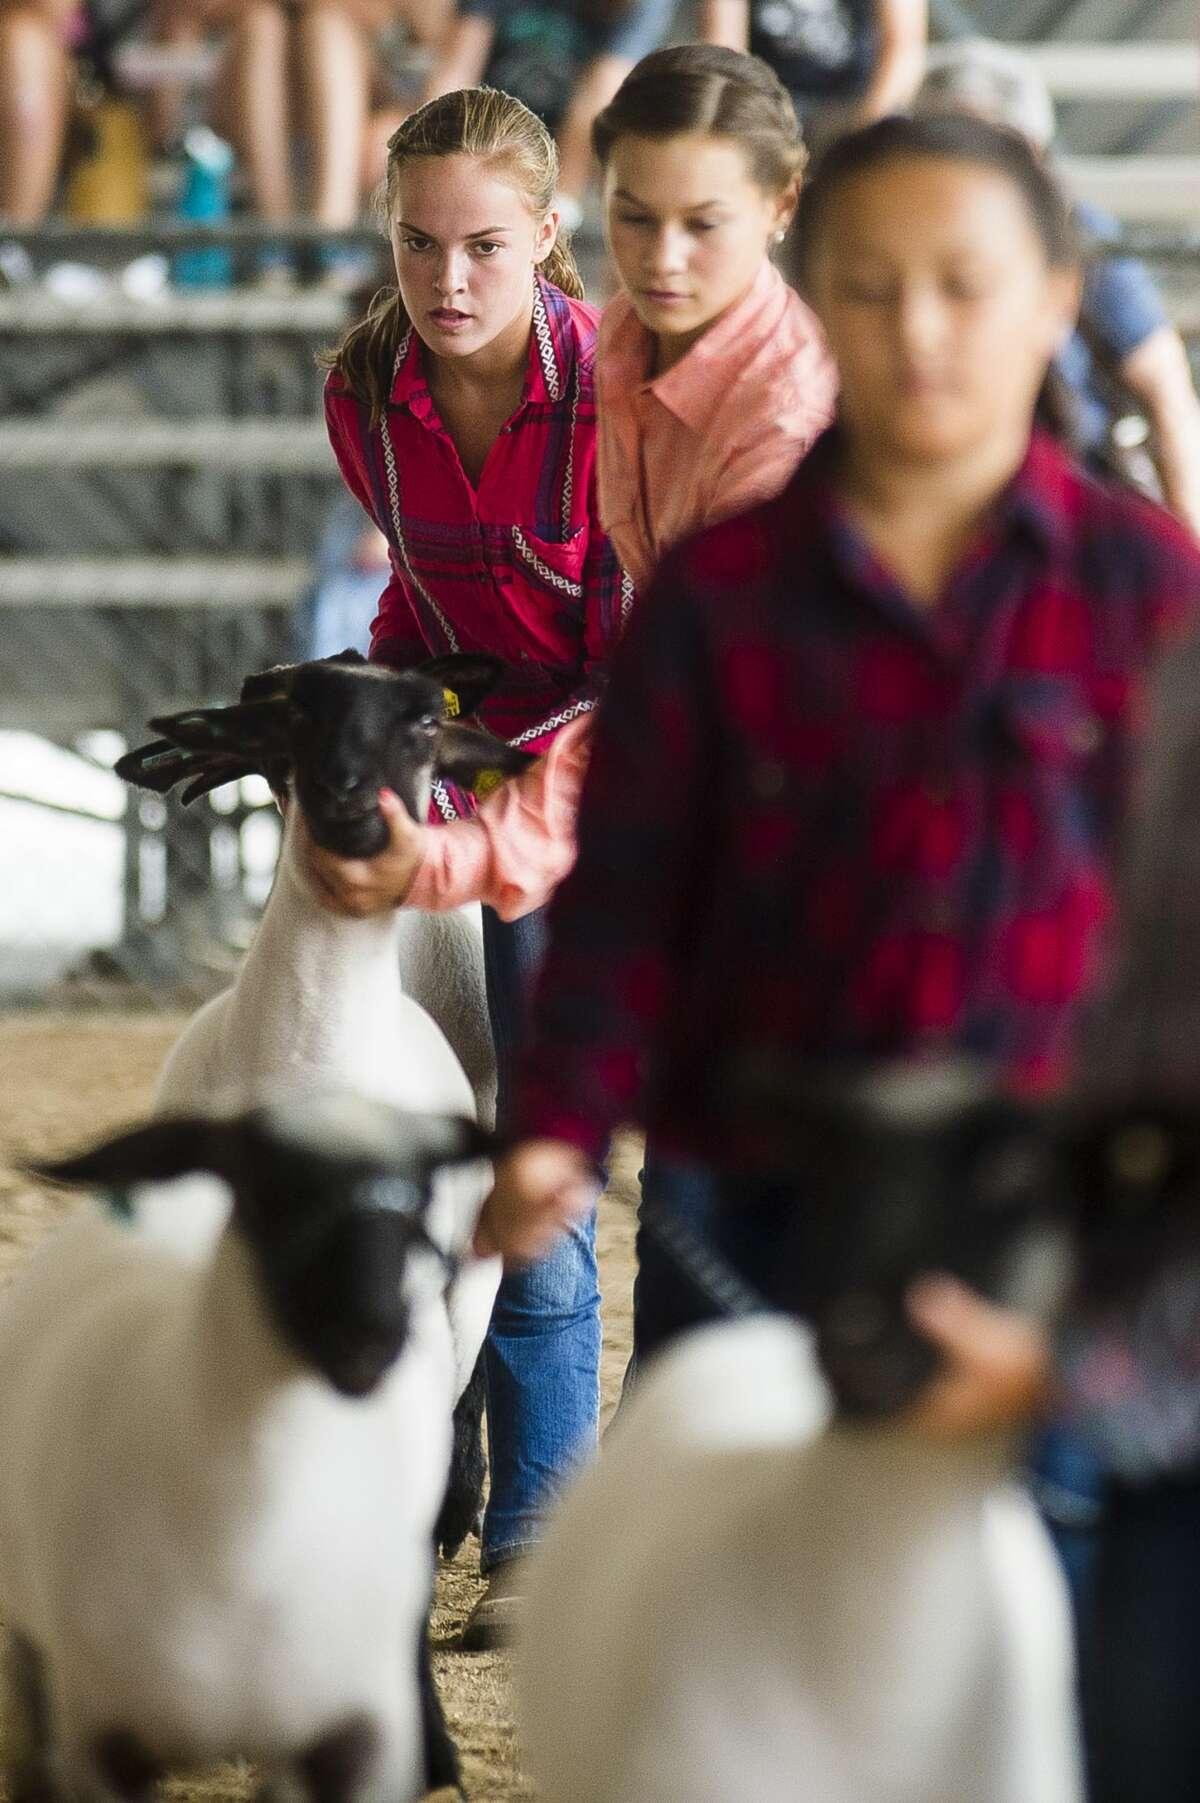 Children compete in Sheep Showmanship during the Midland County Fair Monday, Aug. 12, 2019. (Katy Kildee/kkildee@mdn.net)